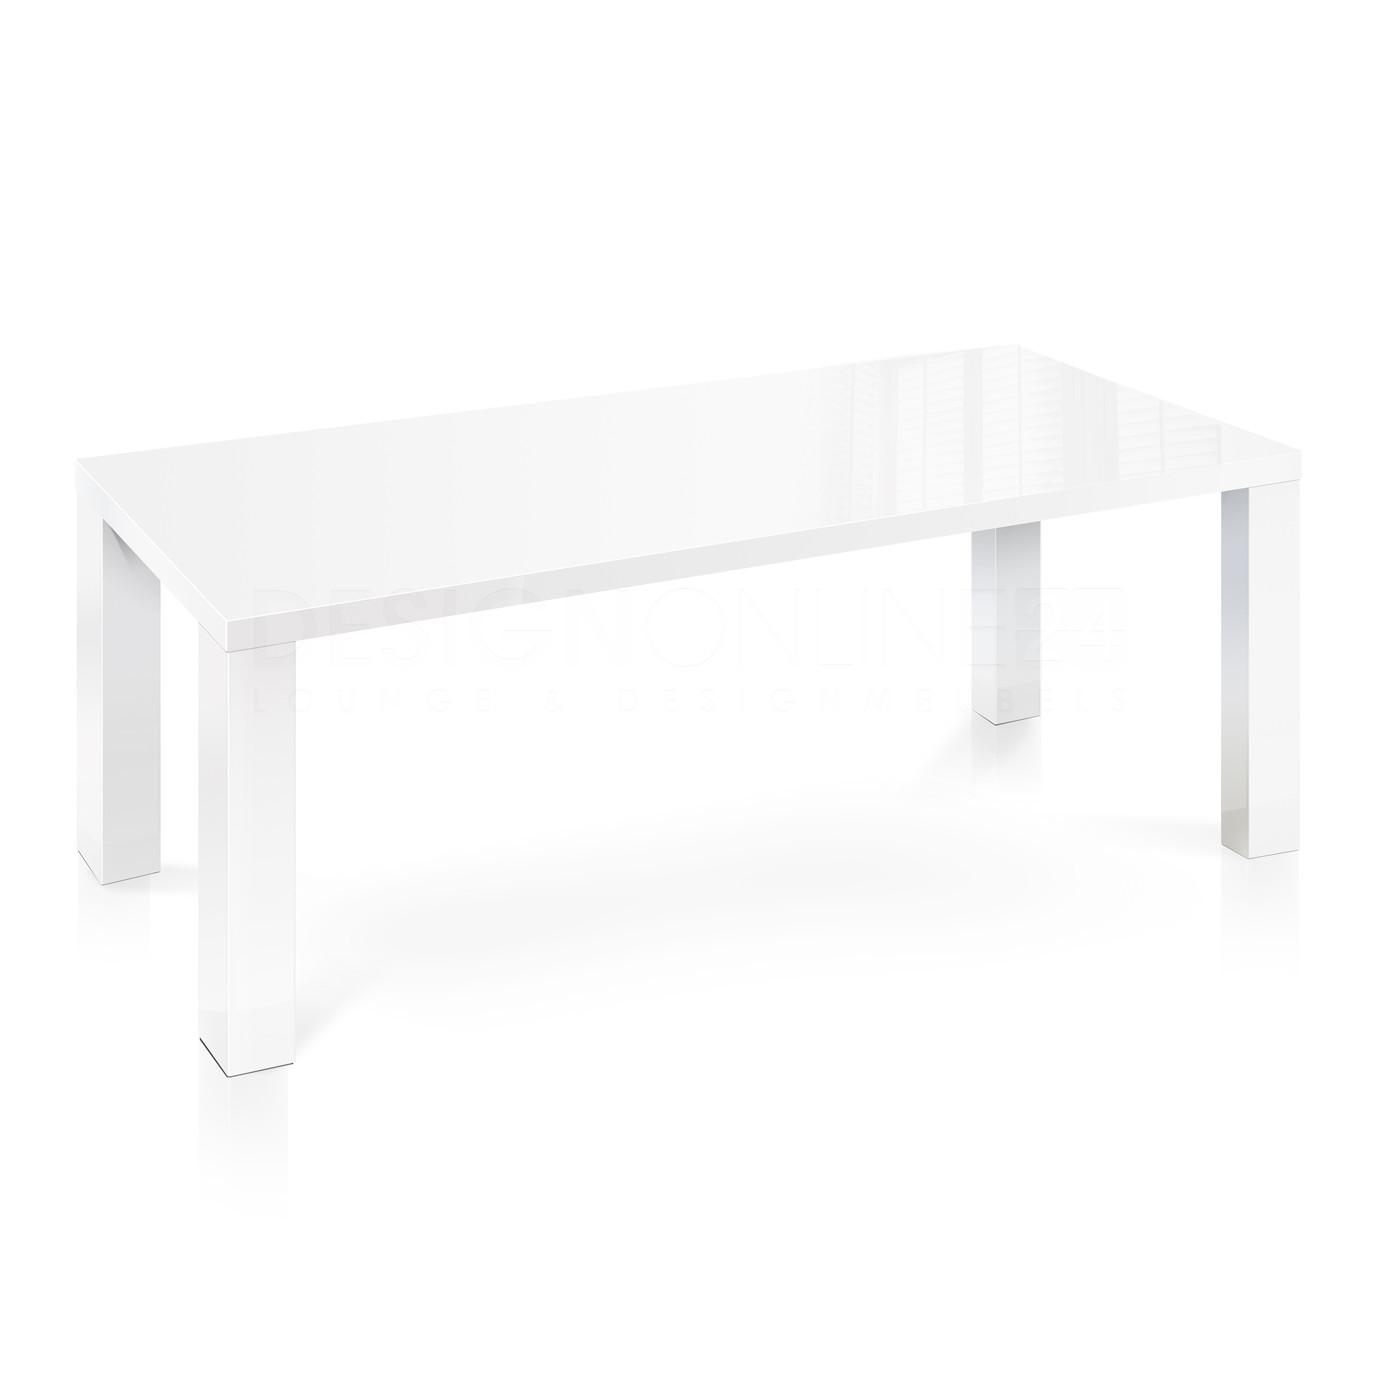 Hoogglans Keuken Krassen : 24designs Tafel High Gloss – L240 X B110 X H76.5 CM – Wit Tafelblad